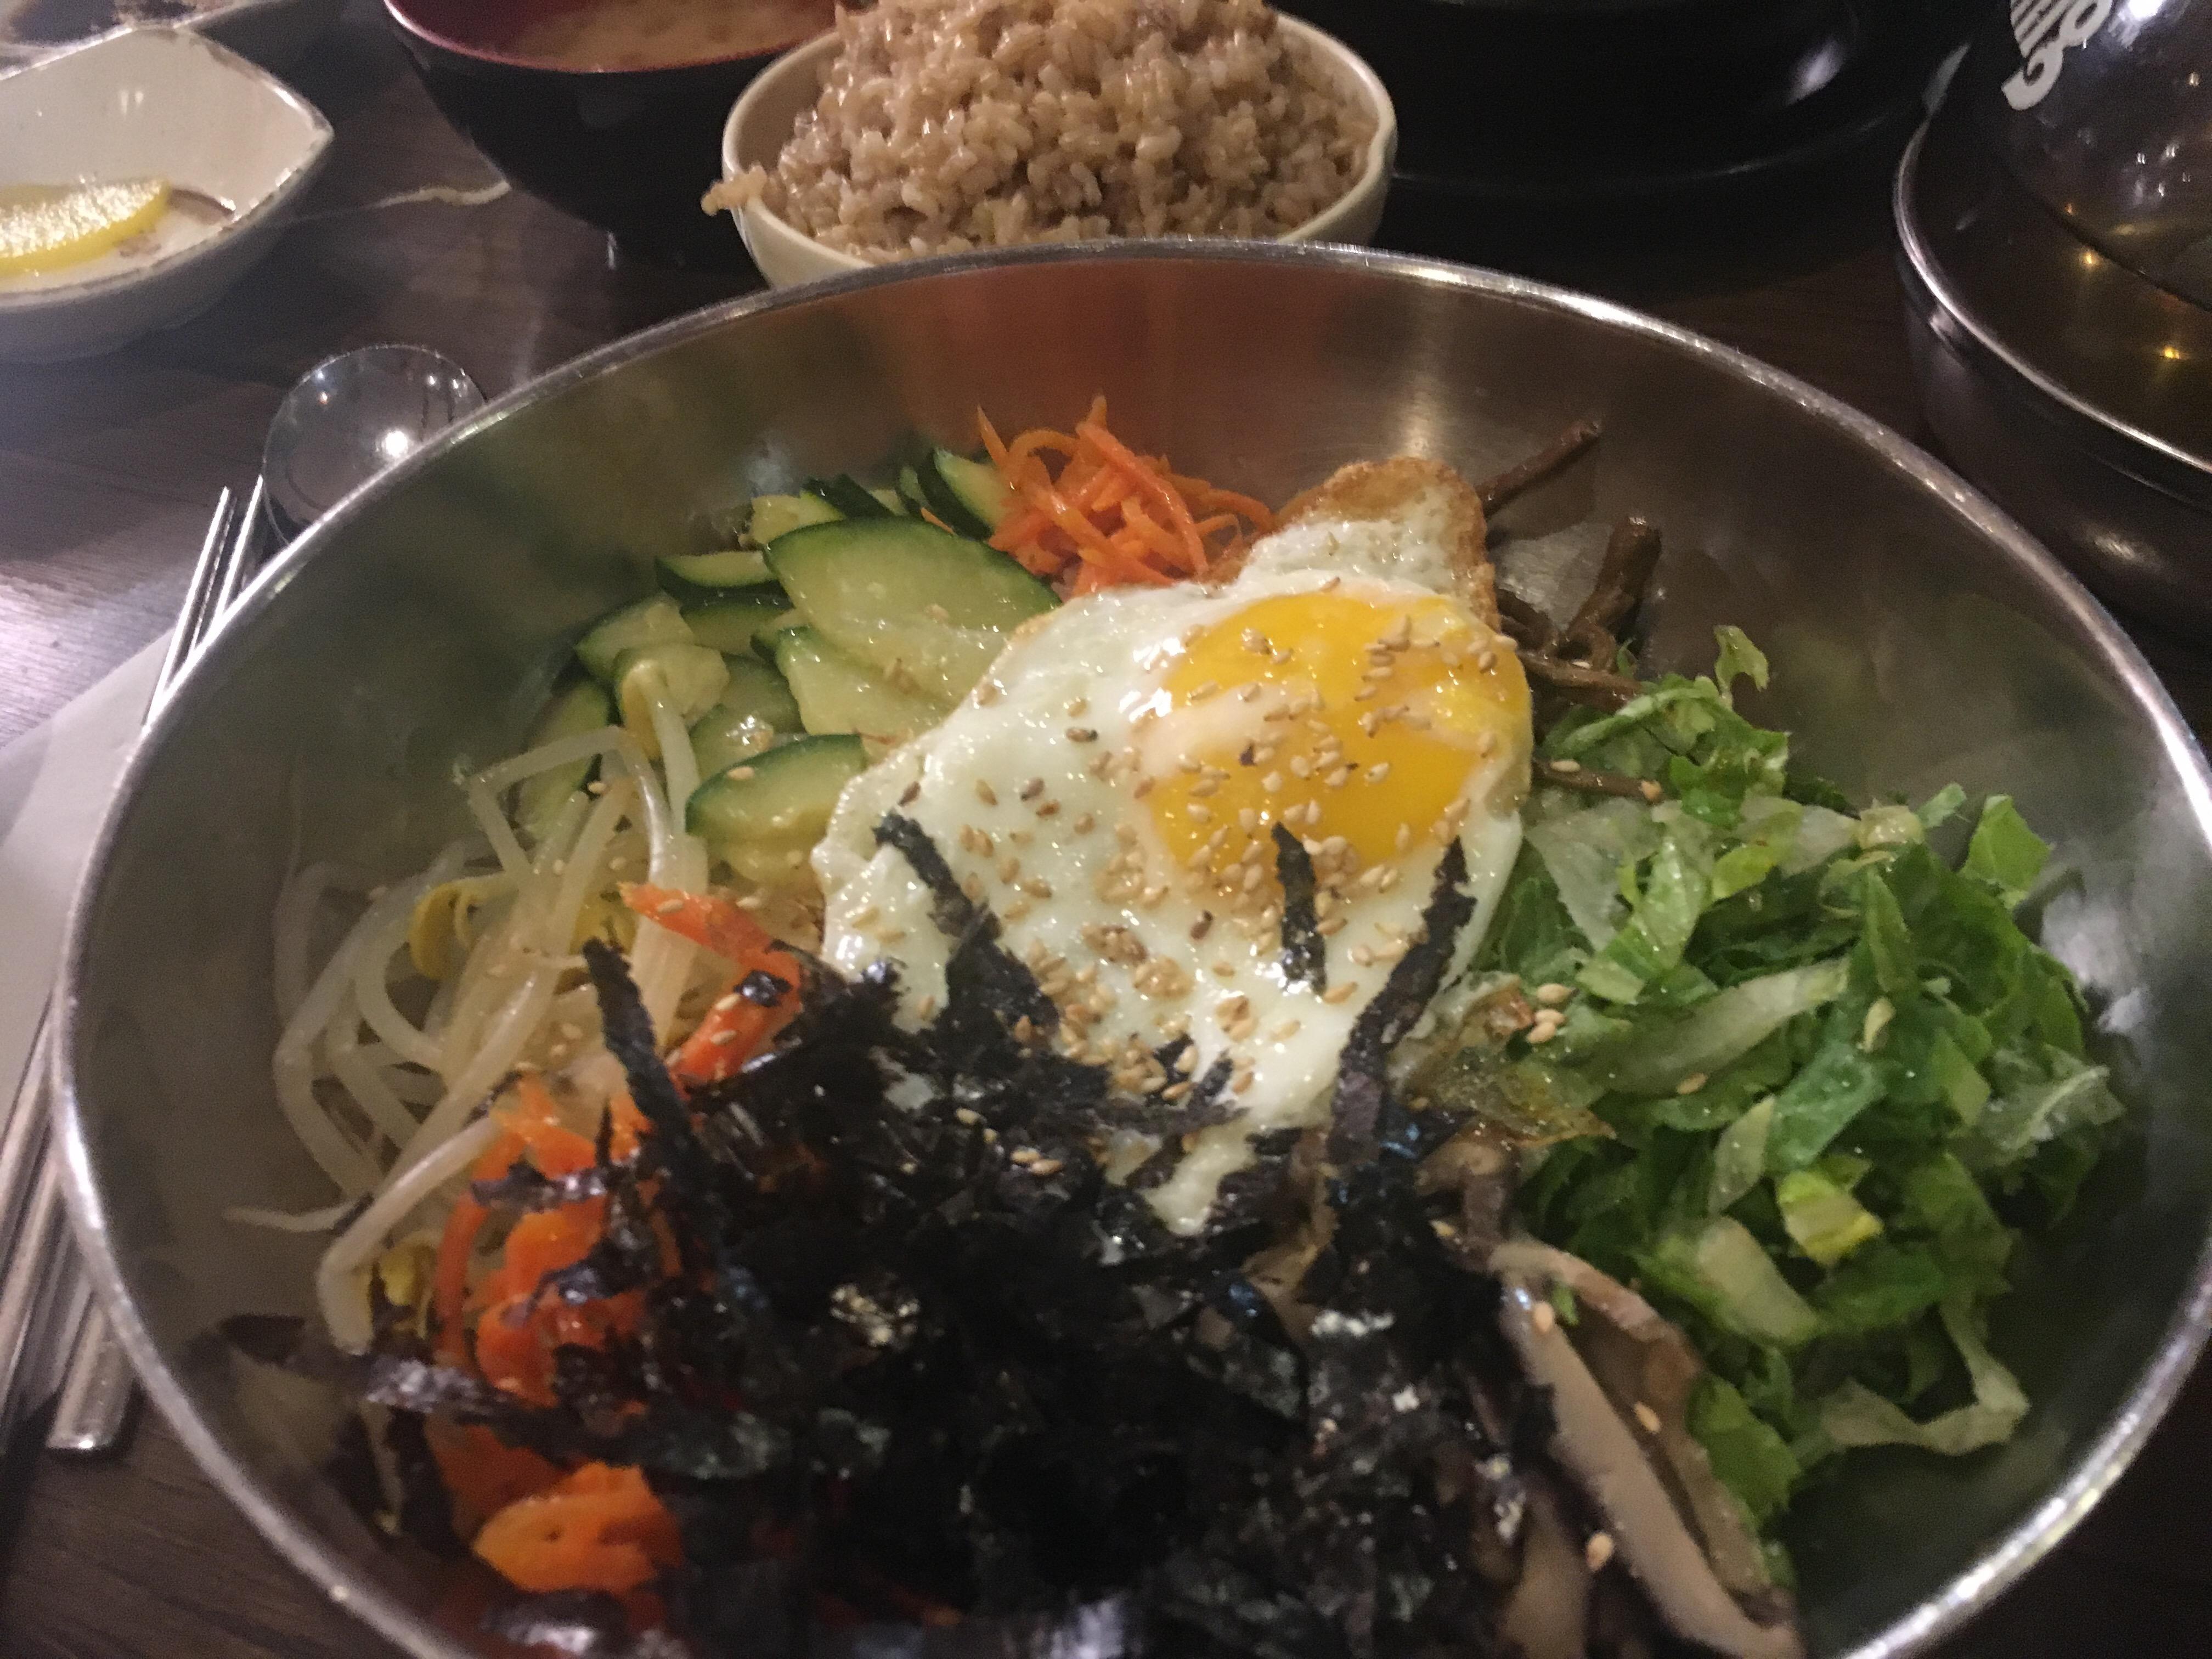 food post 003 amazing korean food awfully charming. Black Bedroom Furniture Sets. Home Design Ideas